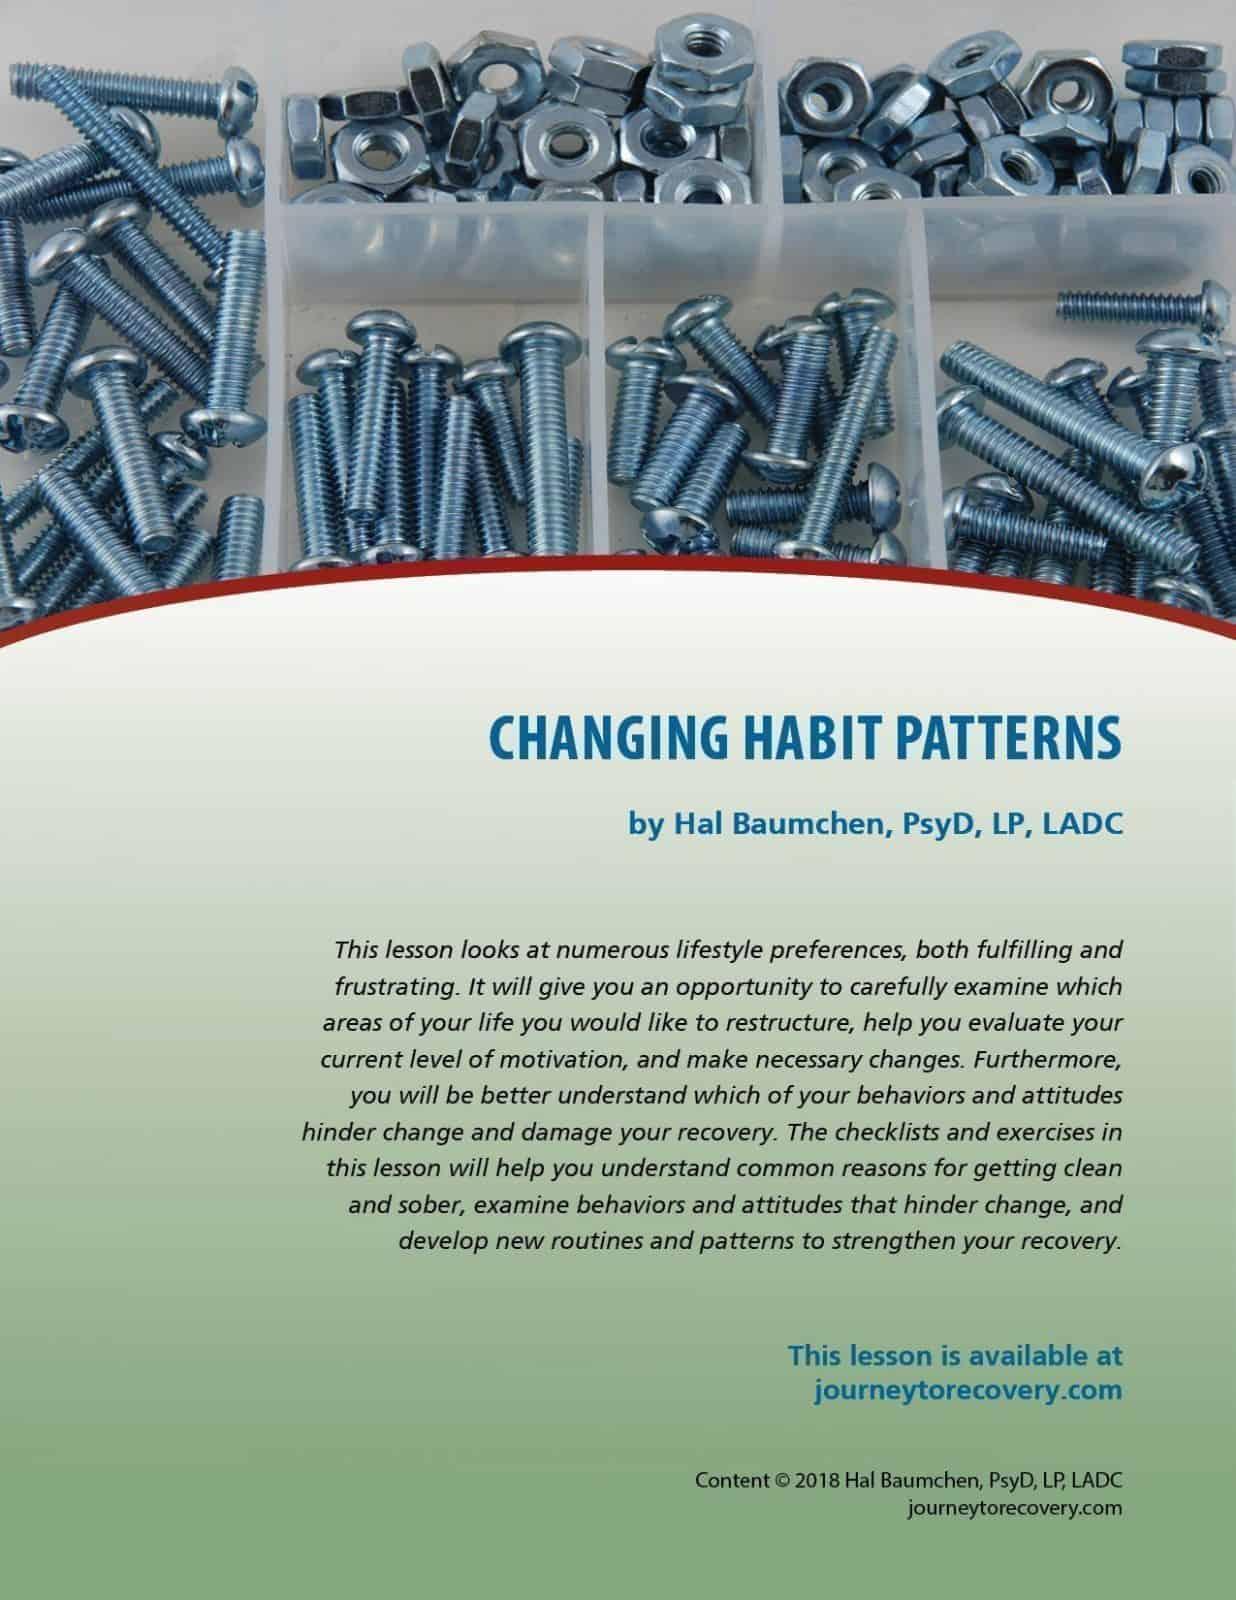 Changing Habit Patterns Cod Lesson